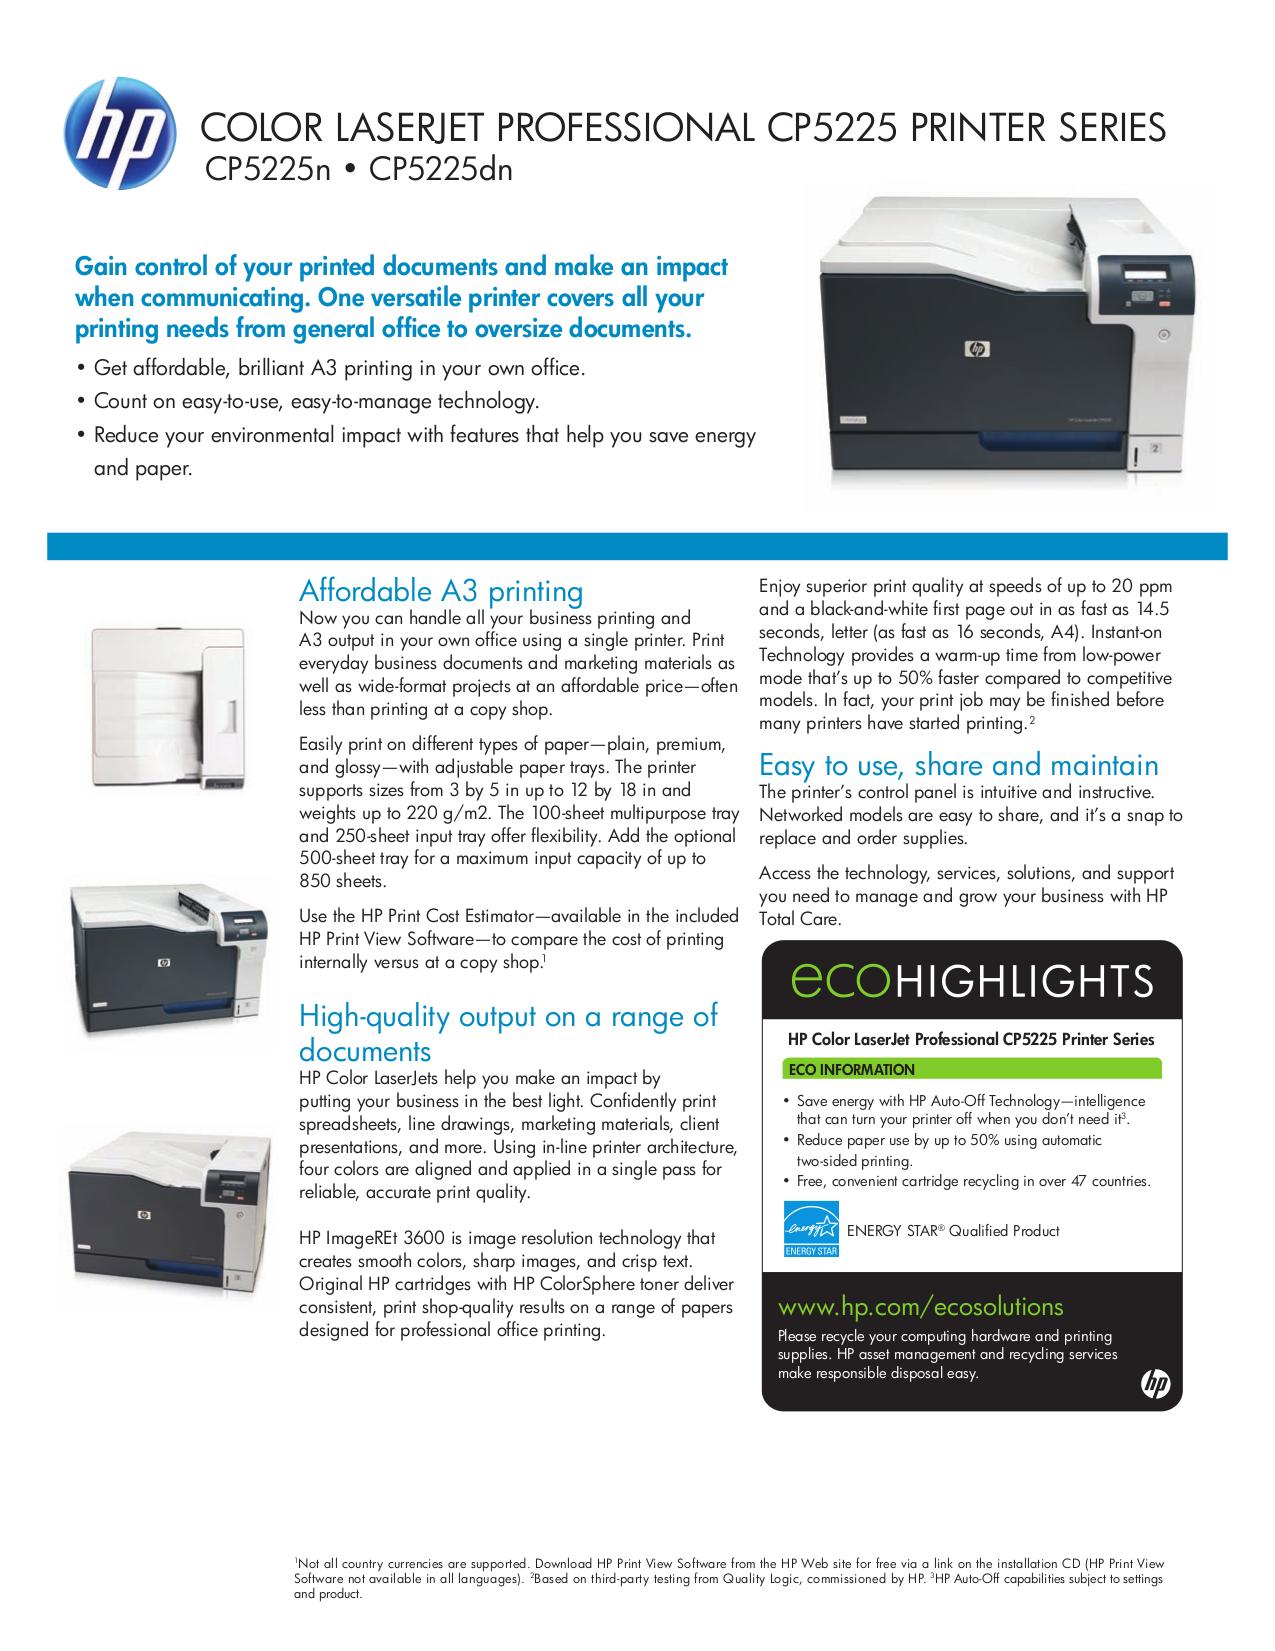 download free pdf for hp laserjet color laserjet pro cp5225n printer rh umlib com HP 3800 Printer HP 1525 Printer